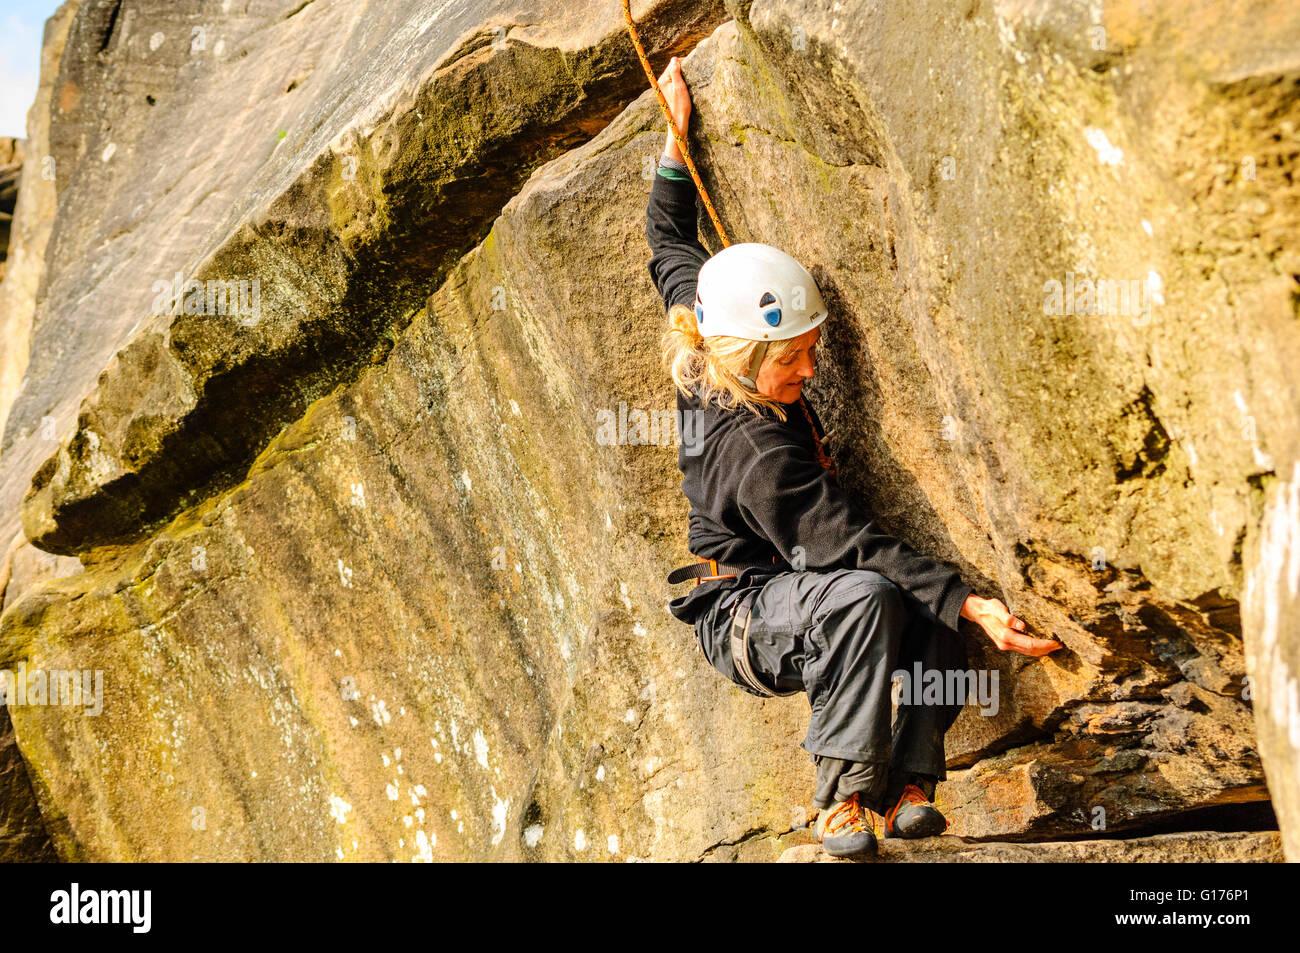 Climber on Tody's Wall, Froggatt Edge, Peak District - Stock Image